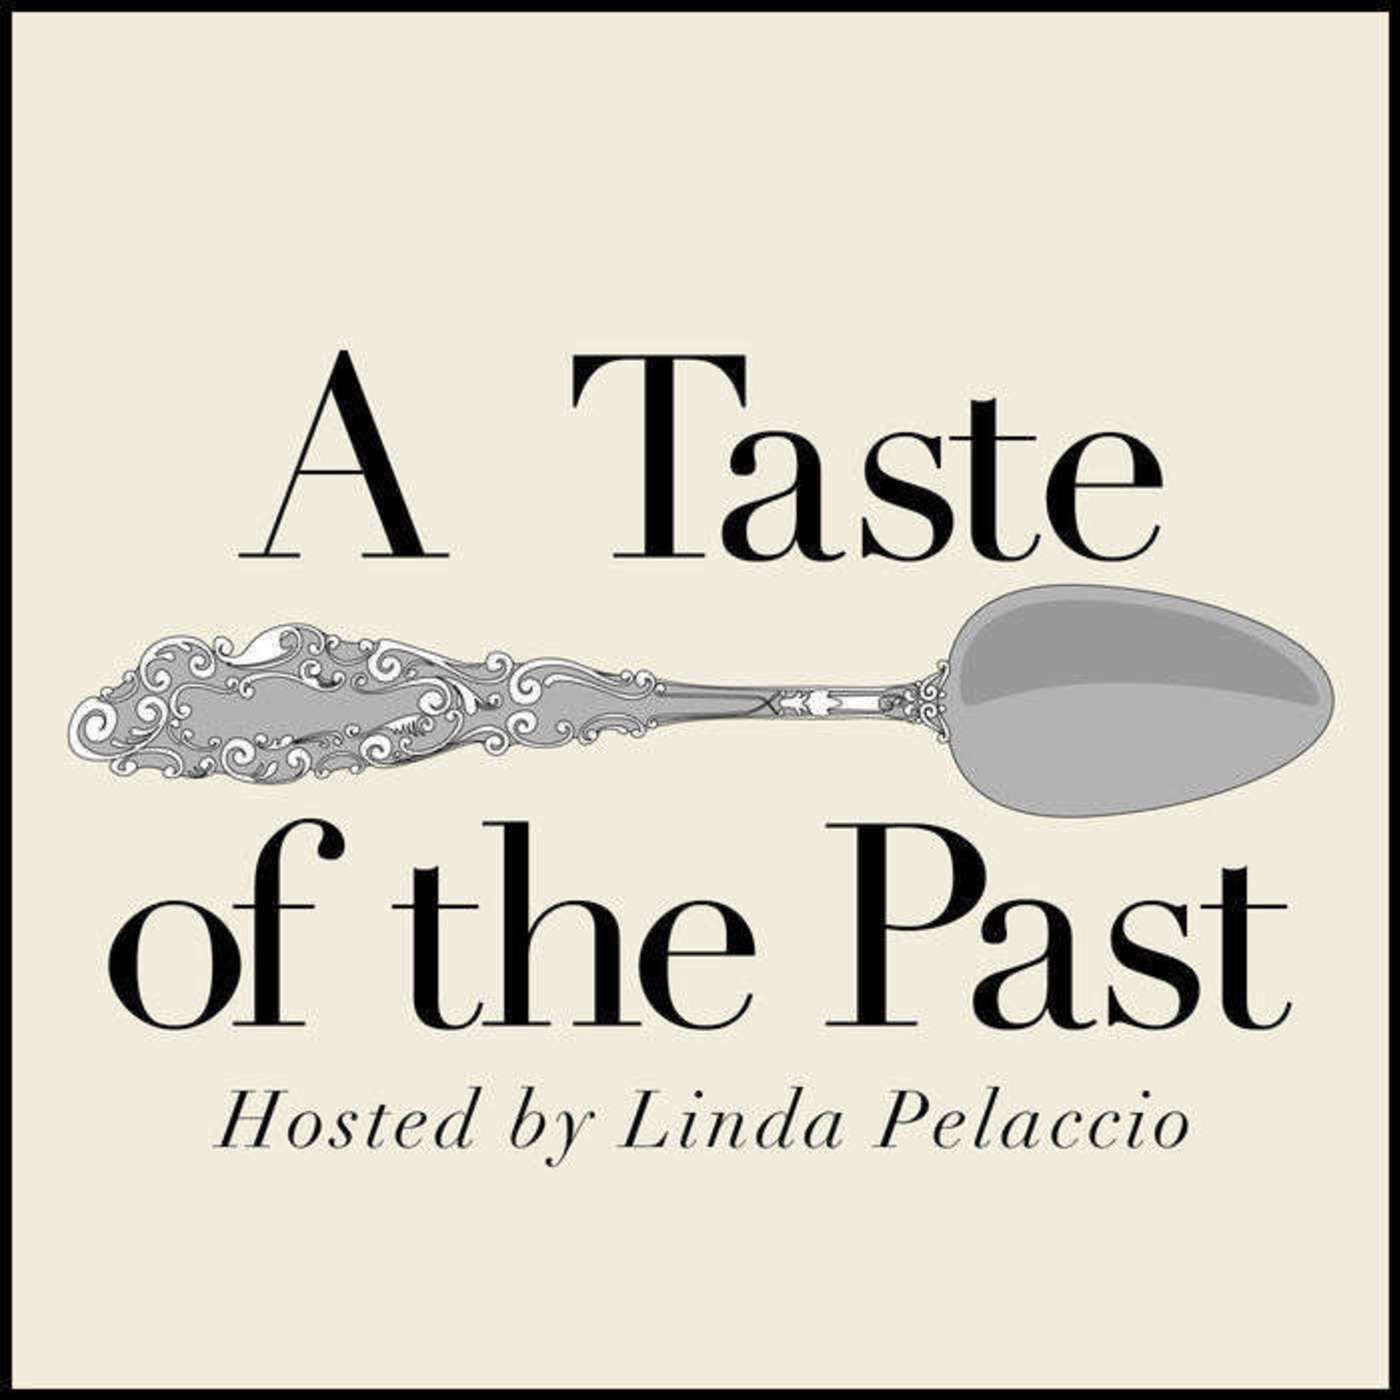 Episode 169: Delmonico's Restaurant